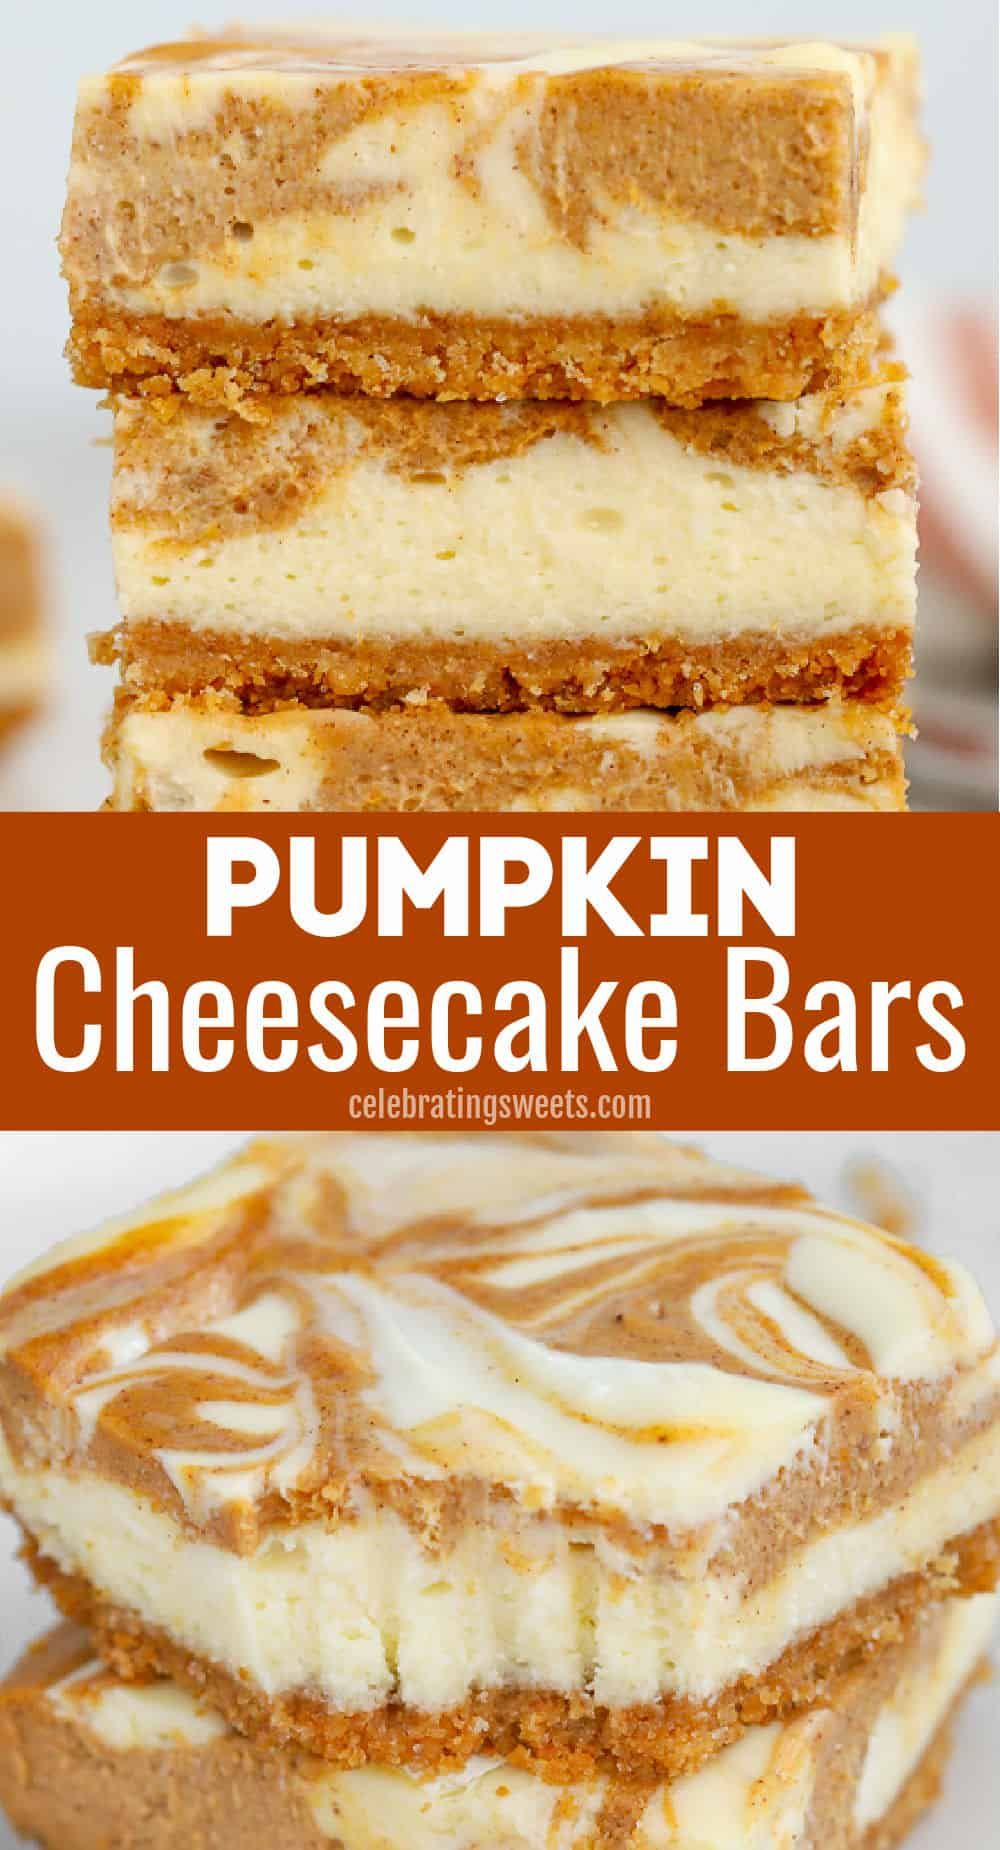 Pumpkin Cheesecake Bars - Celebrating Sweets